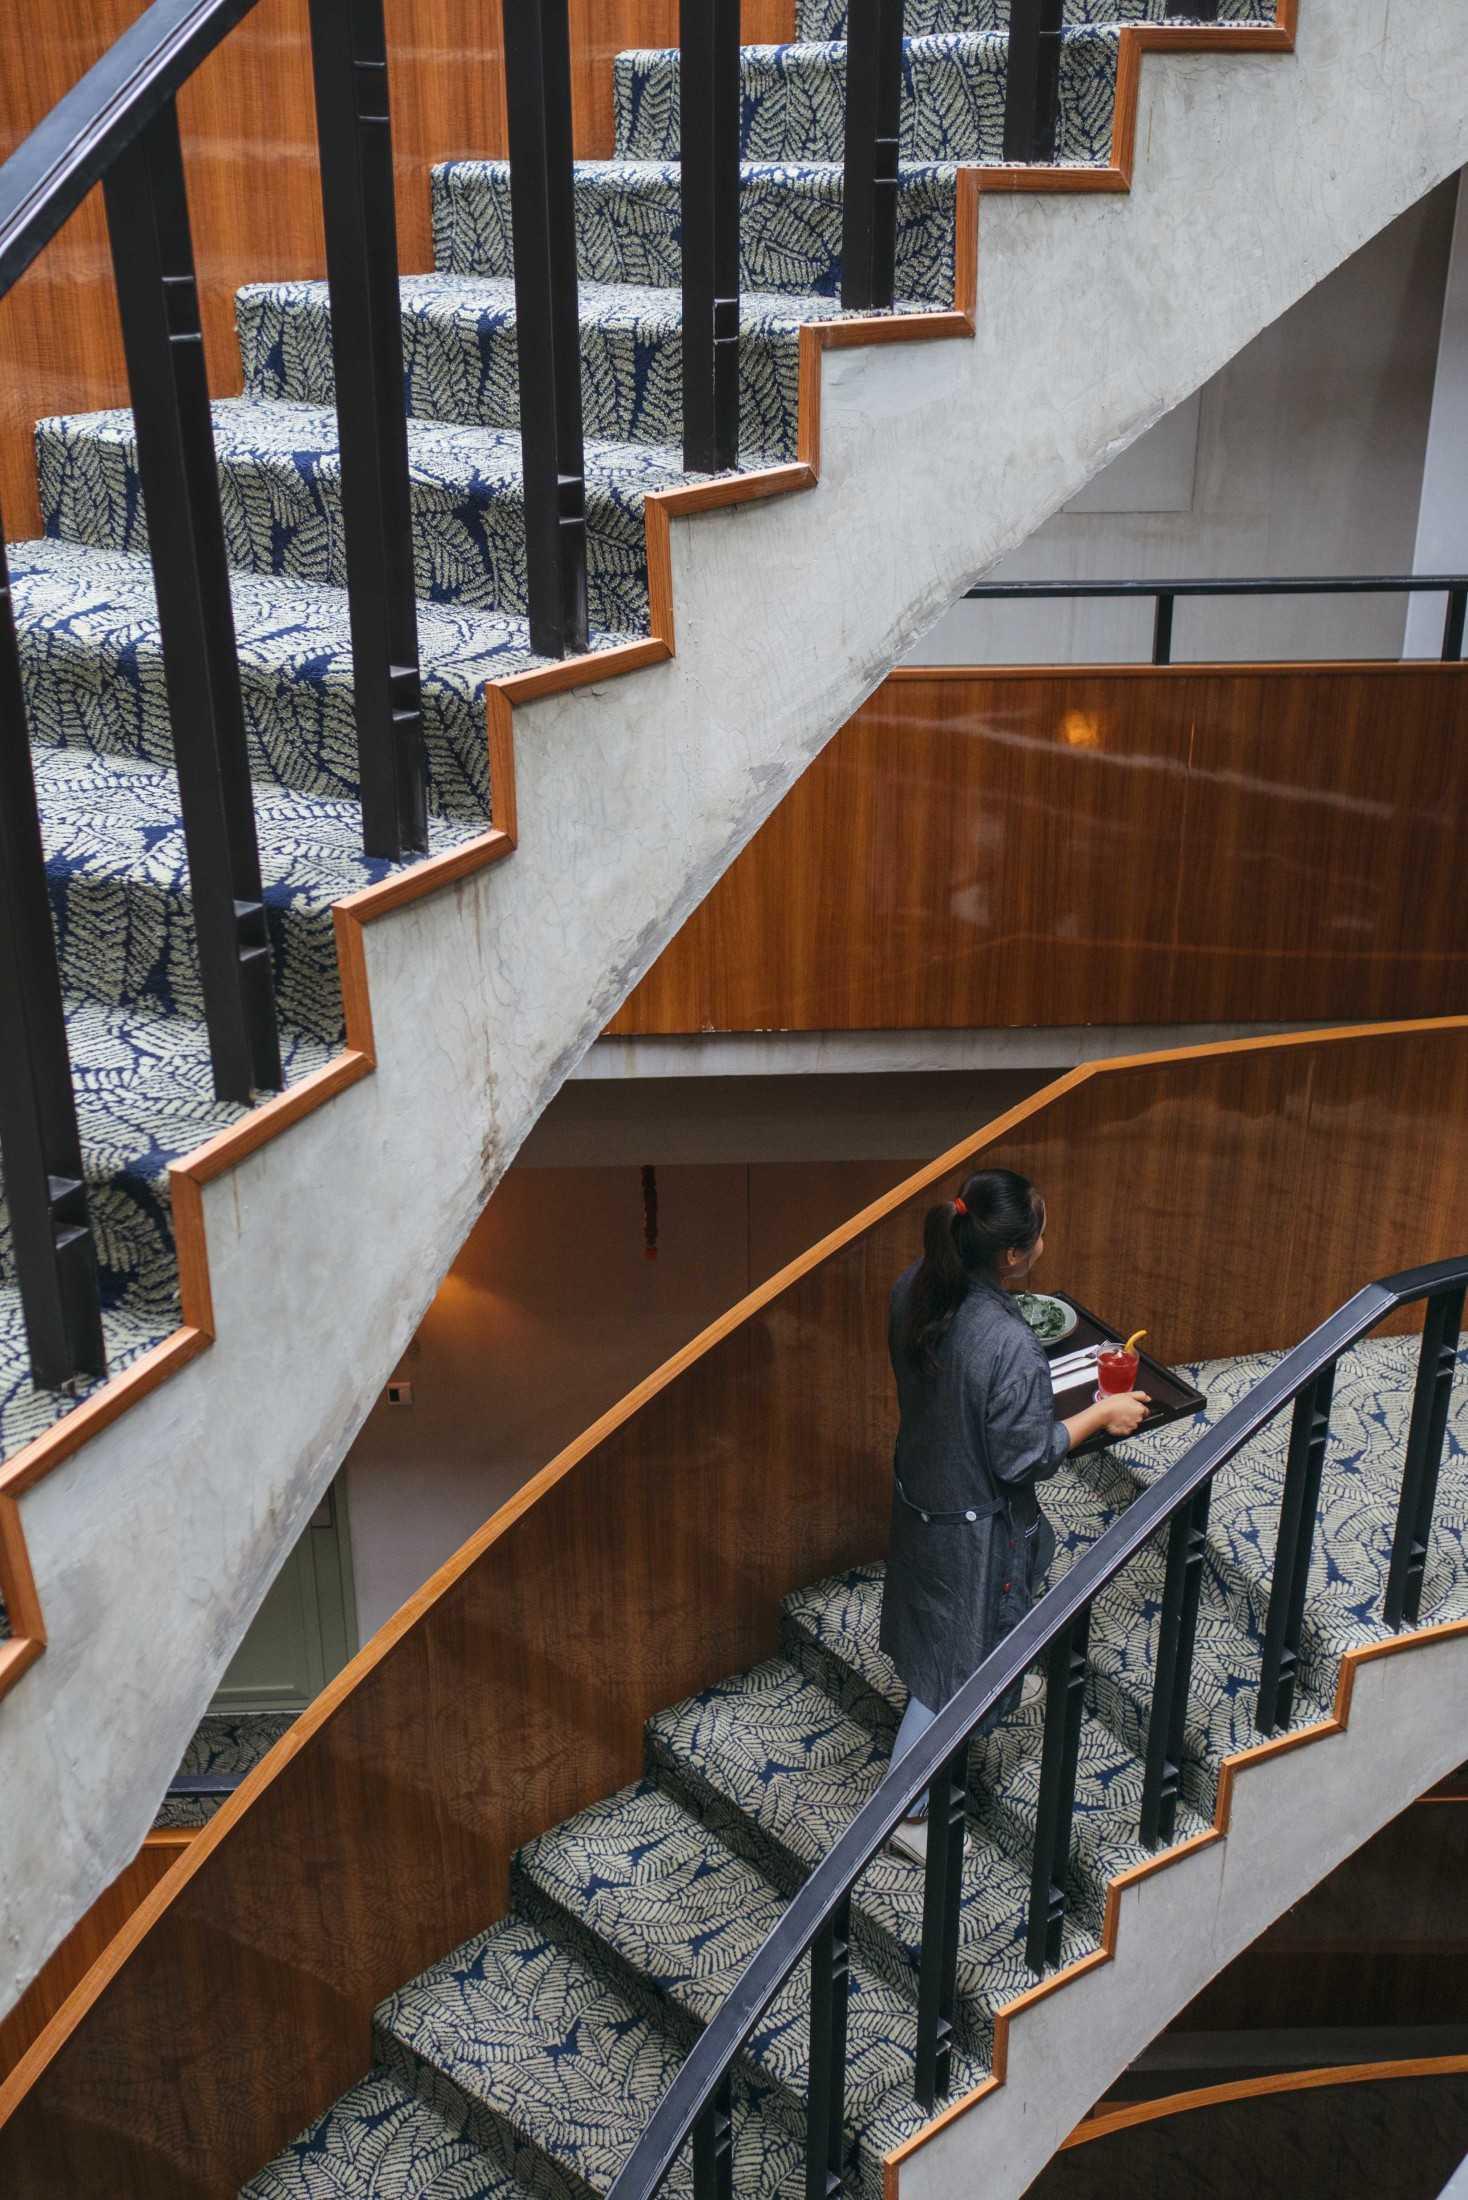 Archid Design&build Monopoli Hotel Kemang, Cipete Sel., Kec. Cilandak, Kota Jakarta Selatan, Daerah Khusus Ibukota Jakarta, Indonesia Kemang, Cipete Sel., Kec. Cilandak, Kota Jakarta Selatan, Daerah Khusus Ibukota Jakarta, Indonesia Archid-Design-Build-Monopoli-Hotel  88048